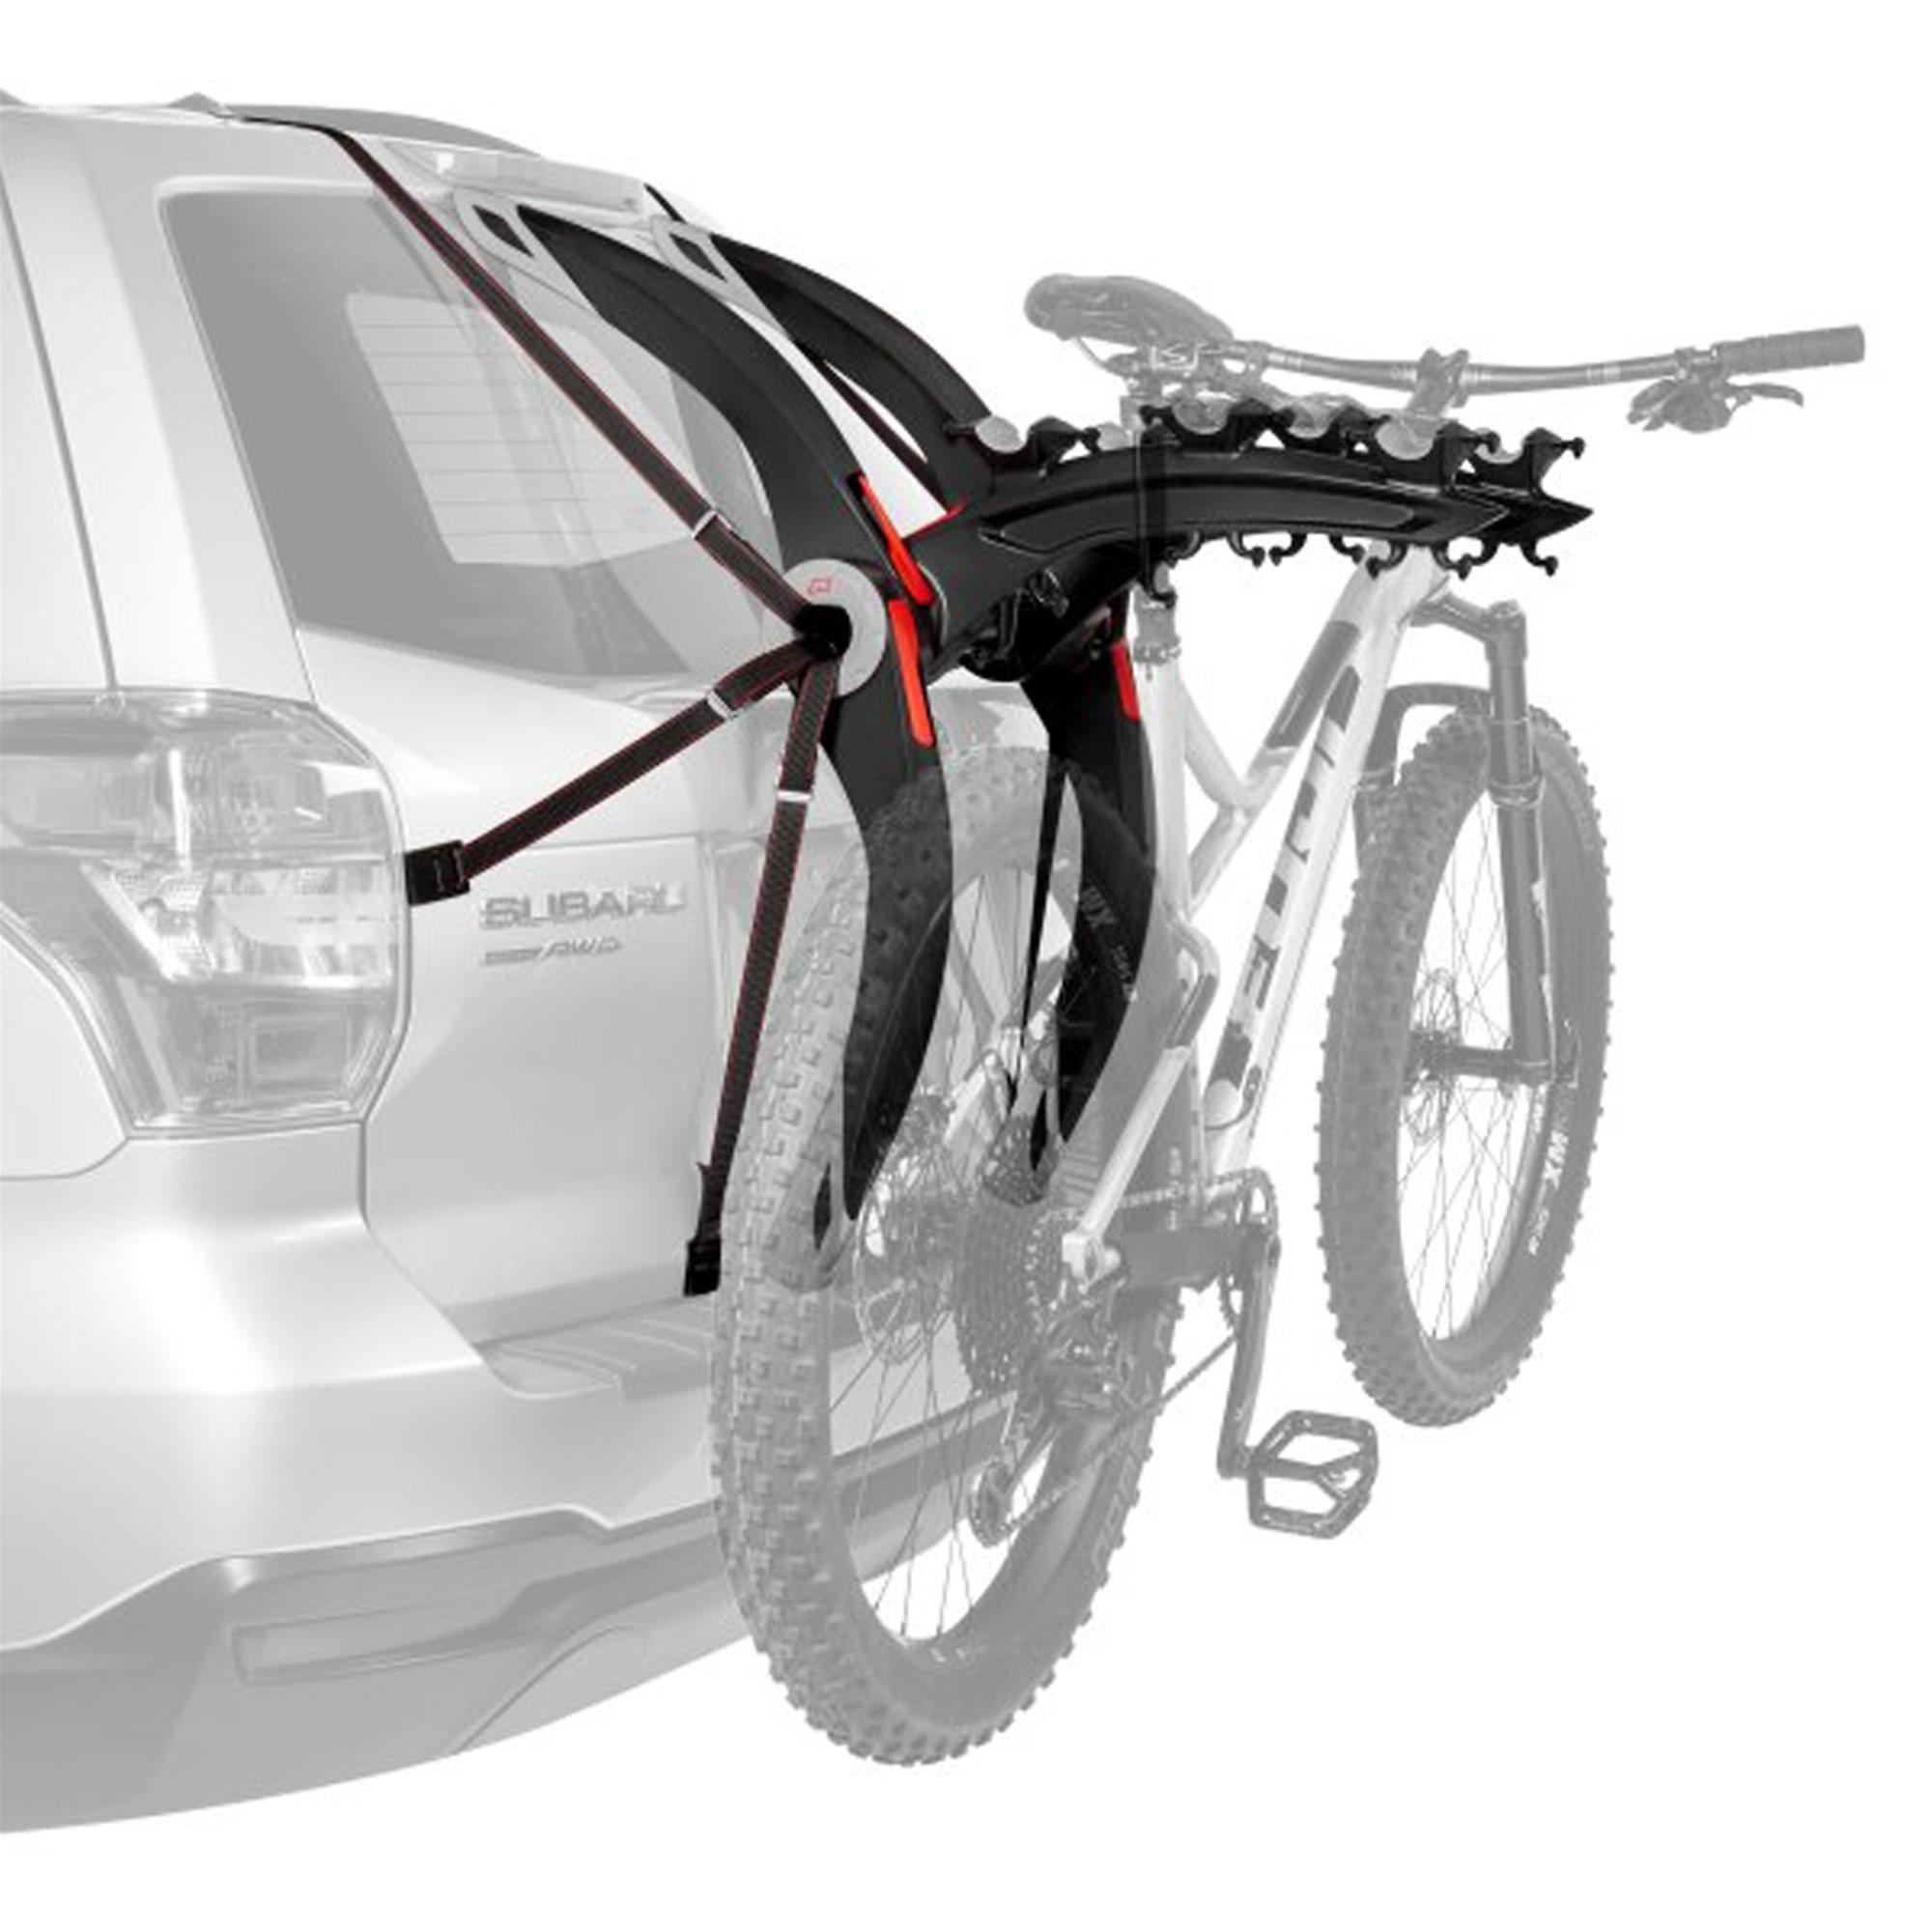 G3 Frame Βάση ποδηλάτου πορτ μπαγκάζ για 3 ποδήλατα   009.23.201